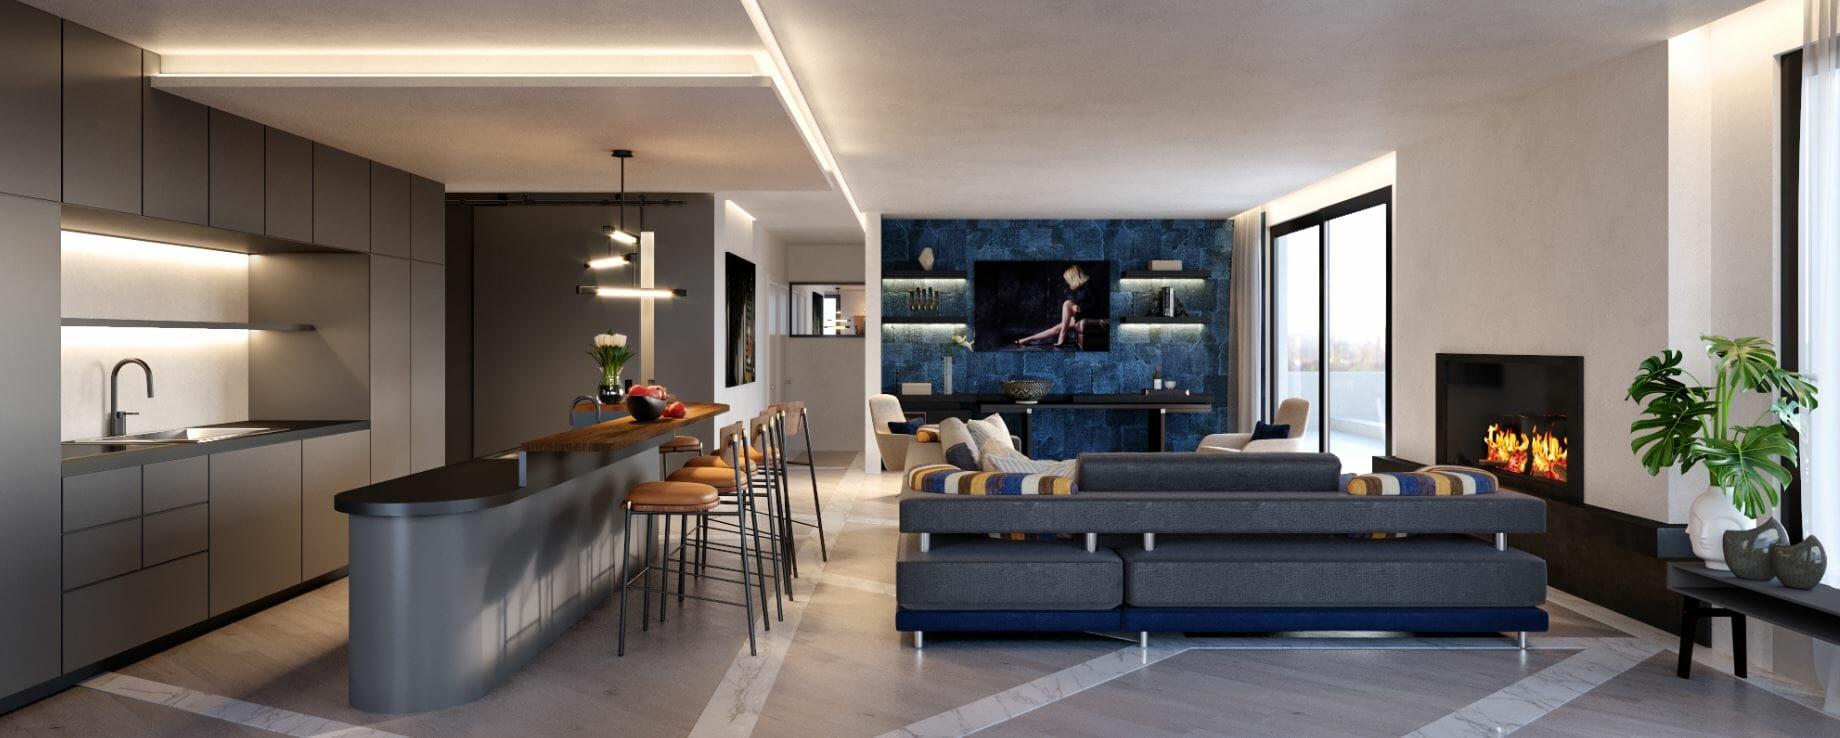 decorilla vs havenly - decorilla living room 3d rendering